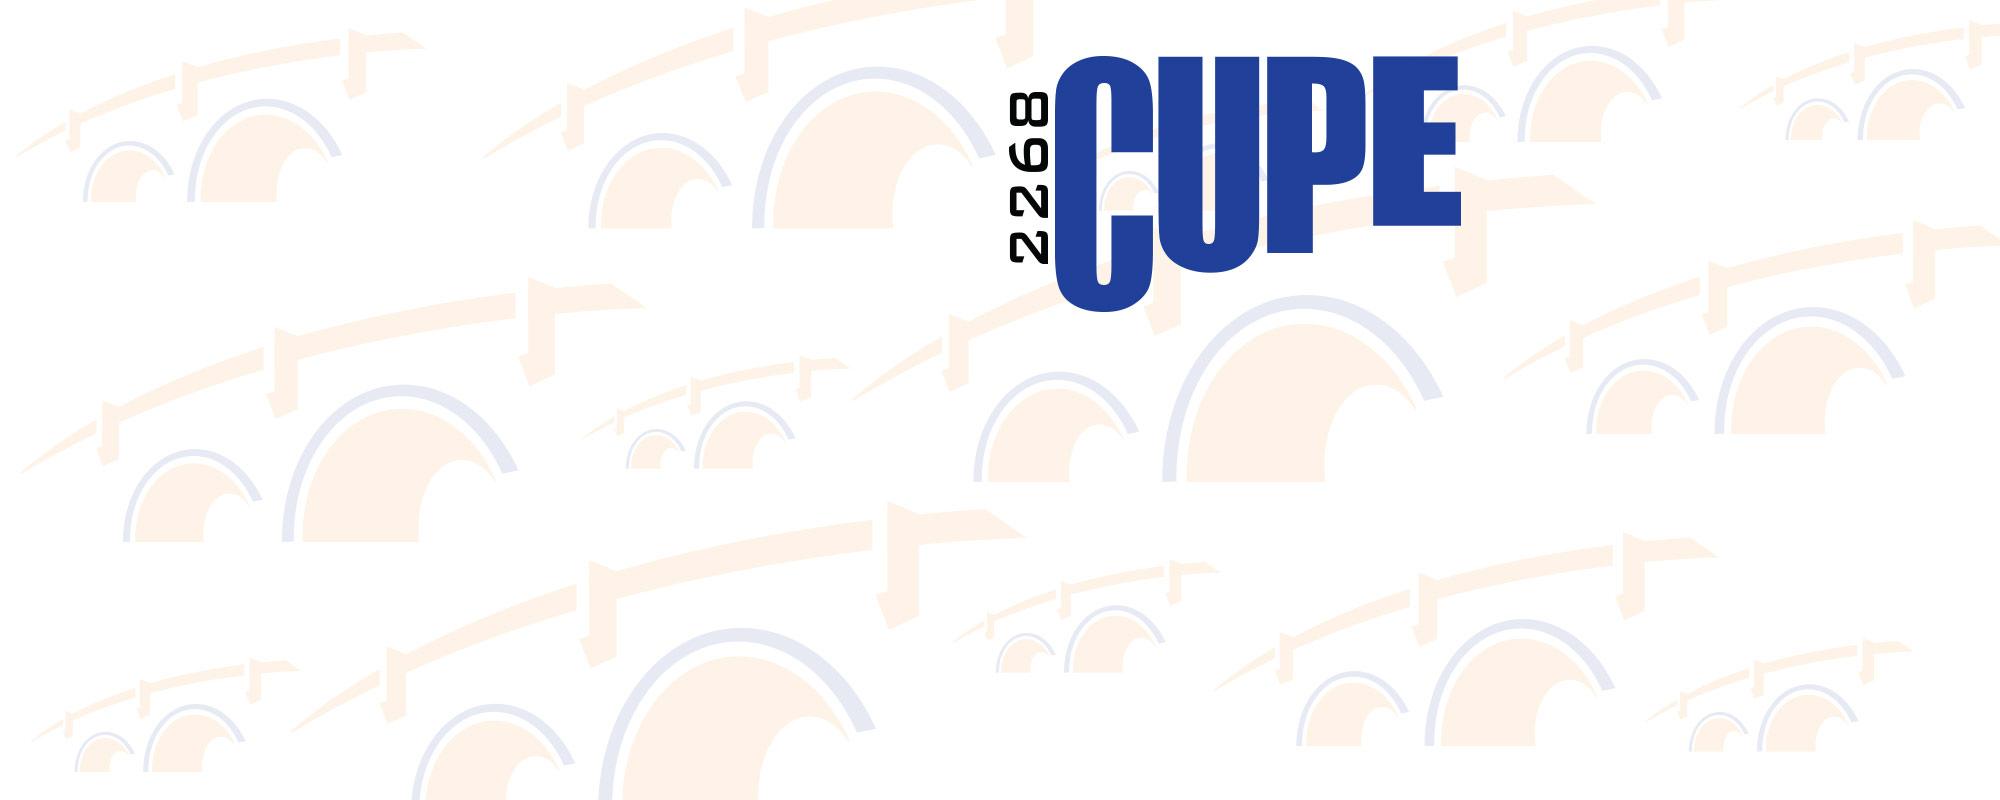 cupe-2268-support-education-saskatoon